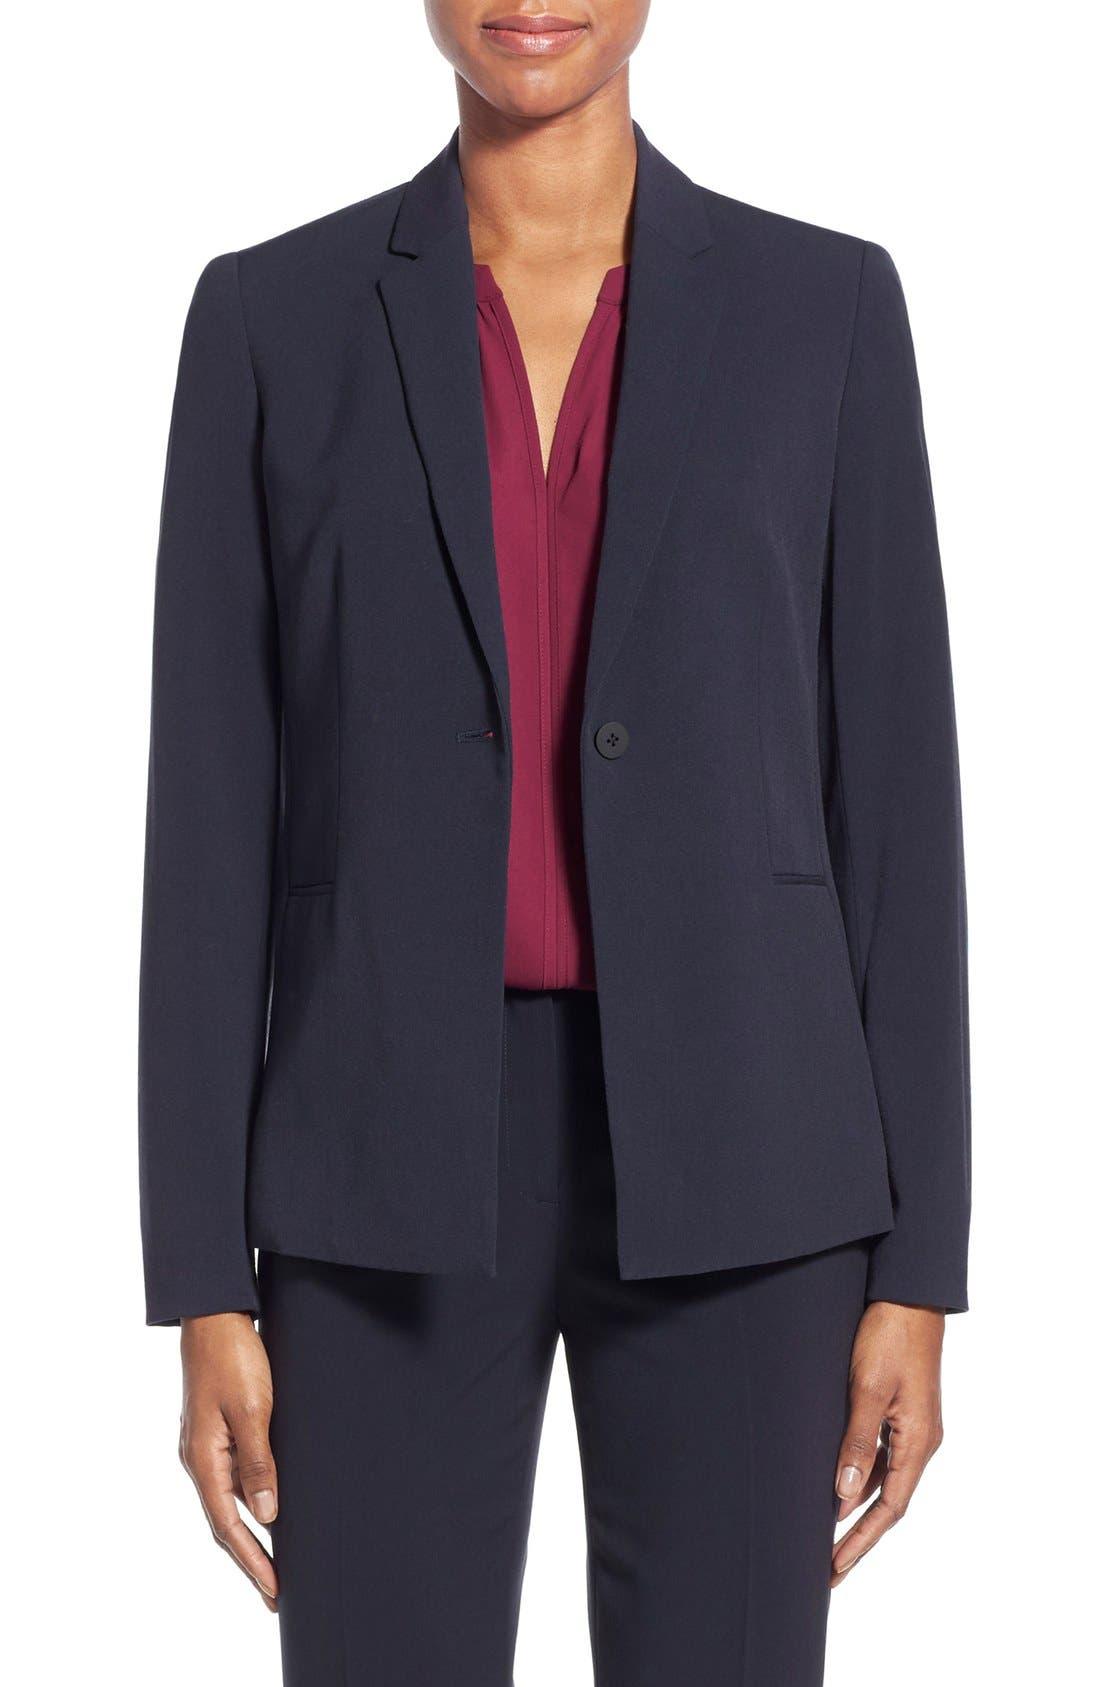 Main Image - T Tahari Jolie Stretch Woven Suit Jacket